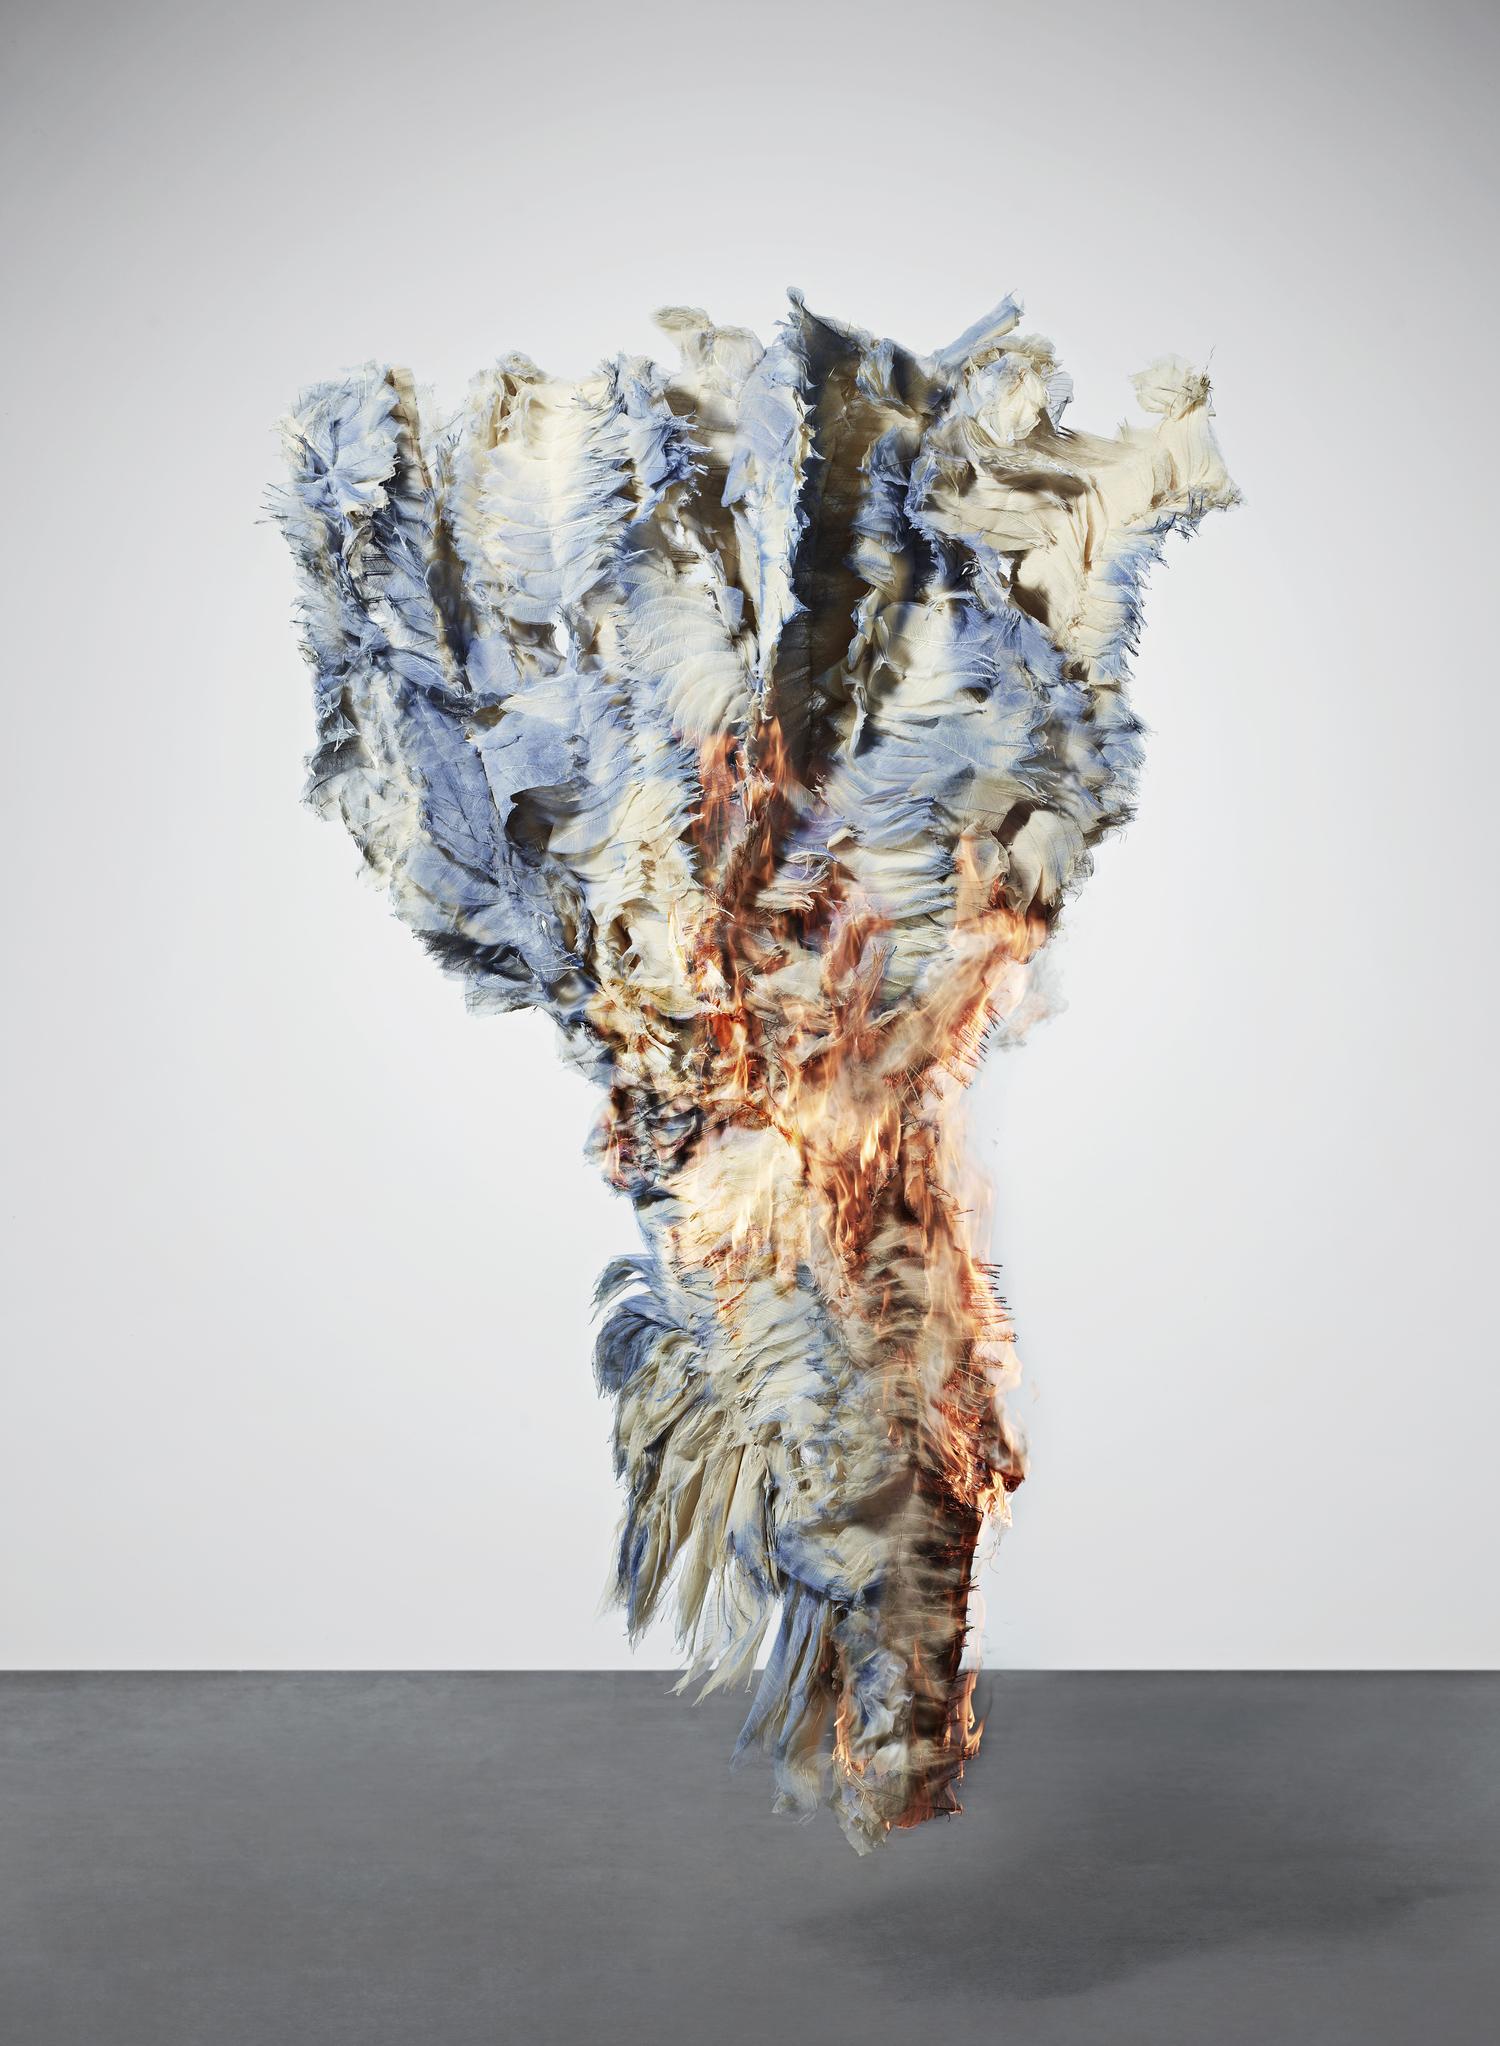 Valediction, a collaboration with photographer Ryan Hopkinson